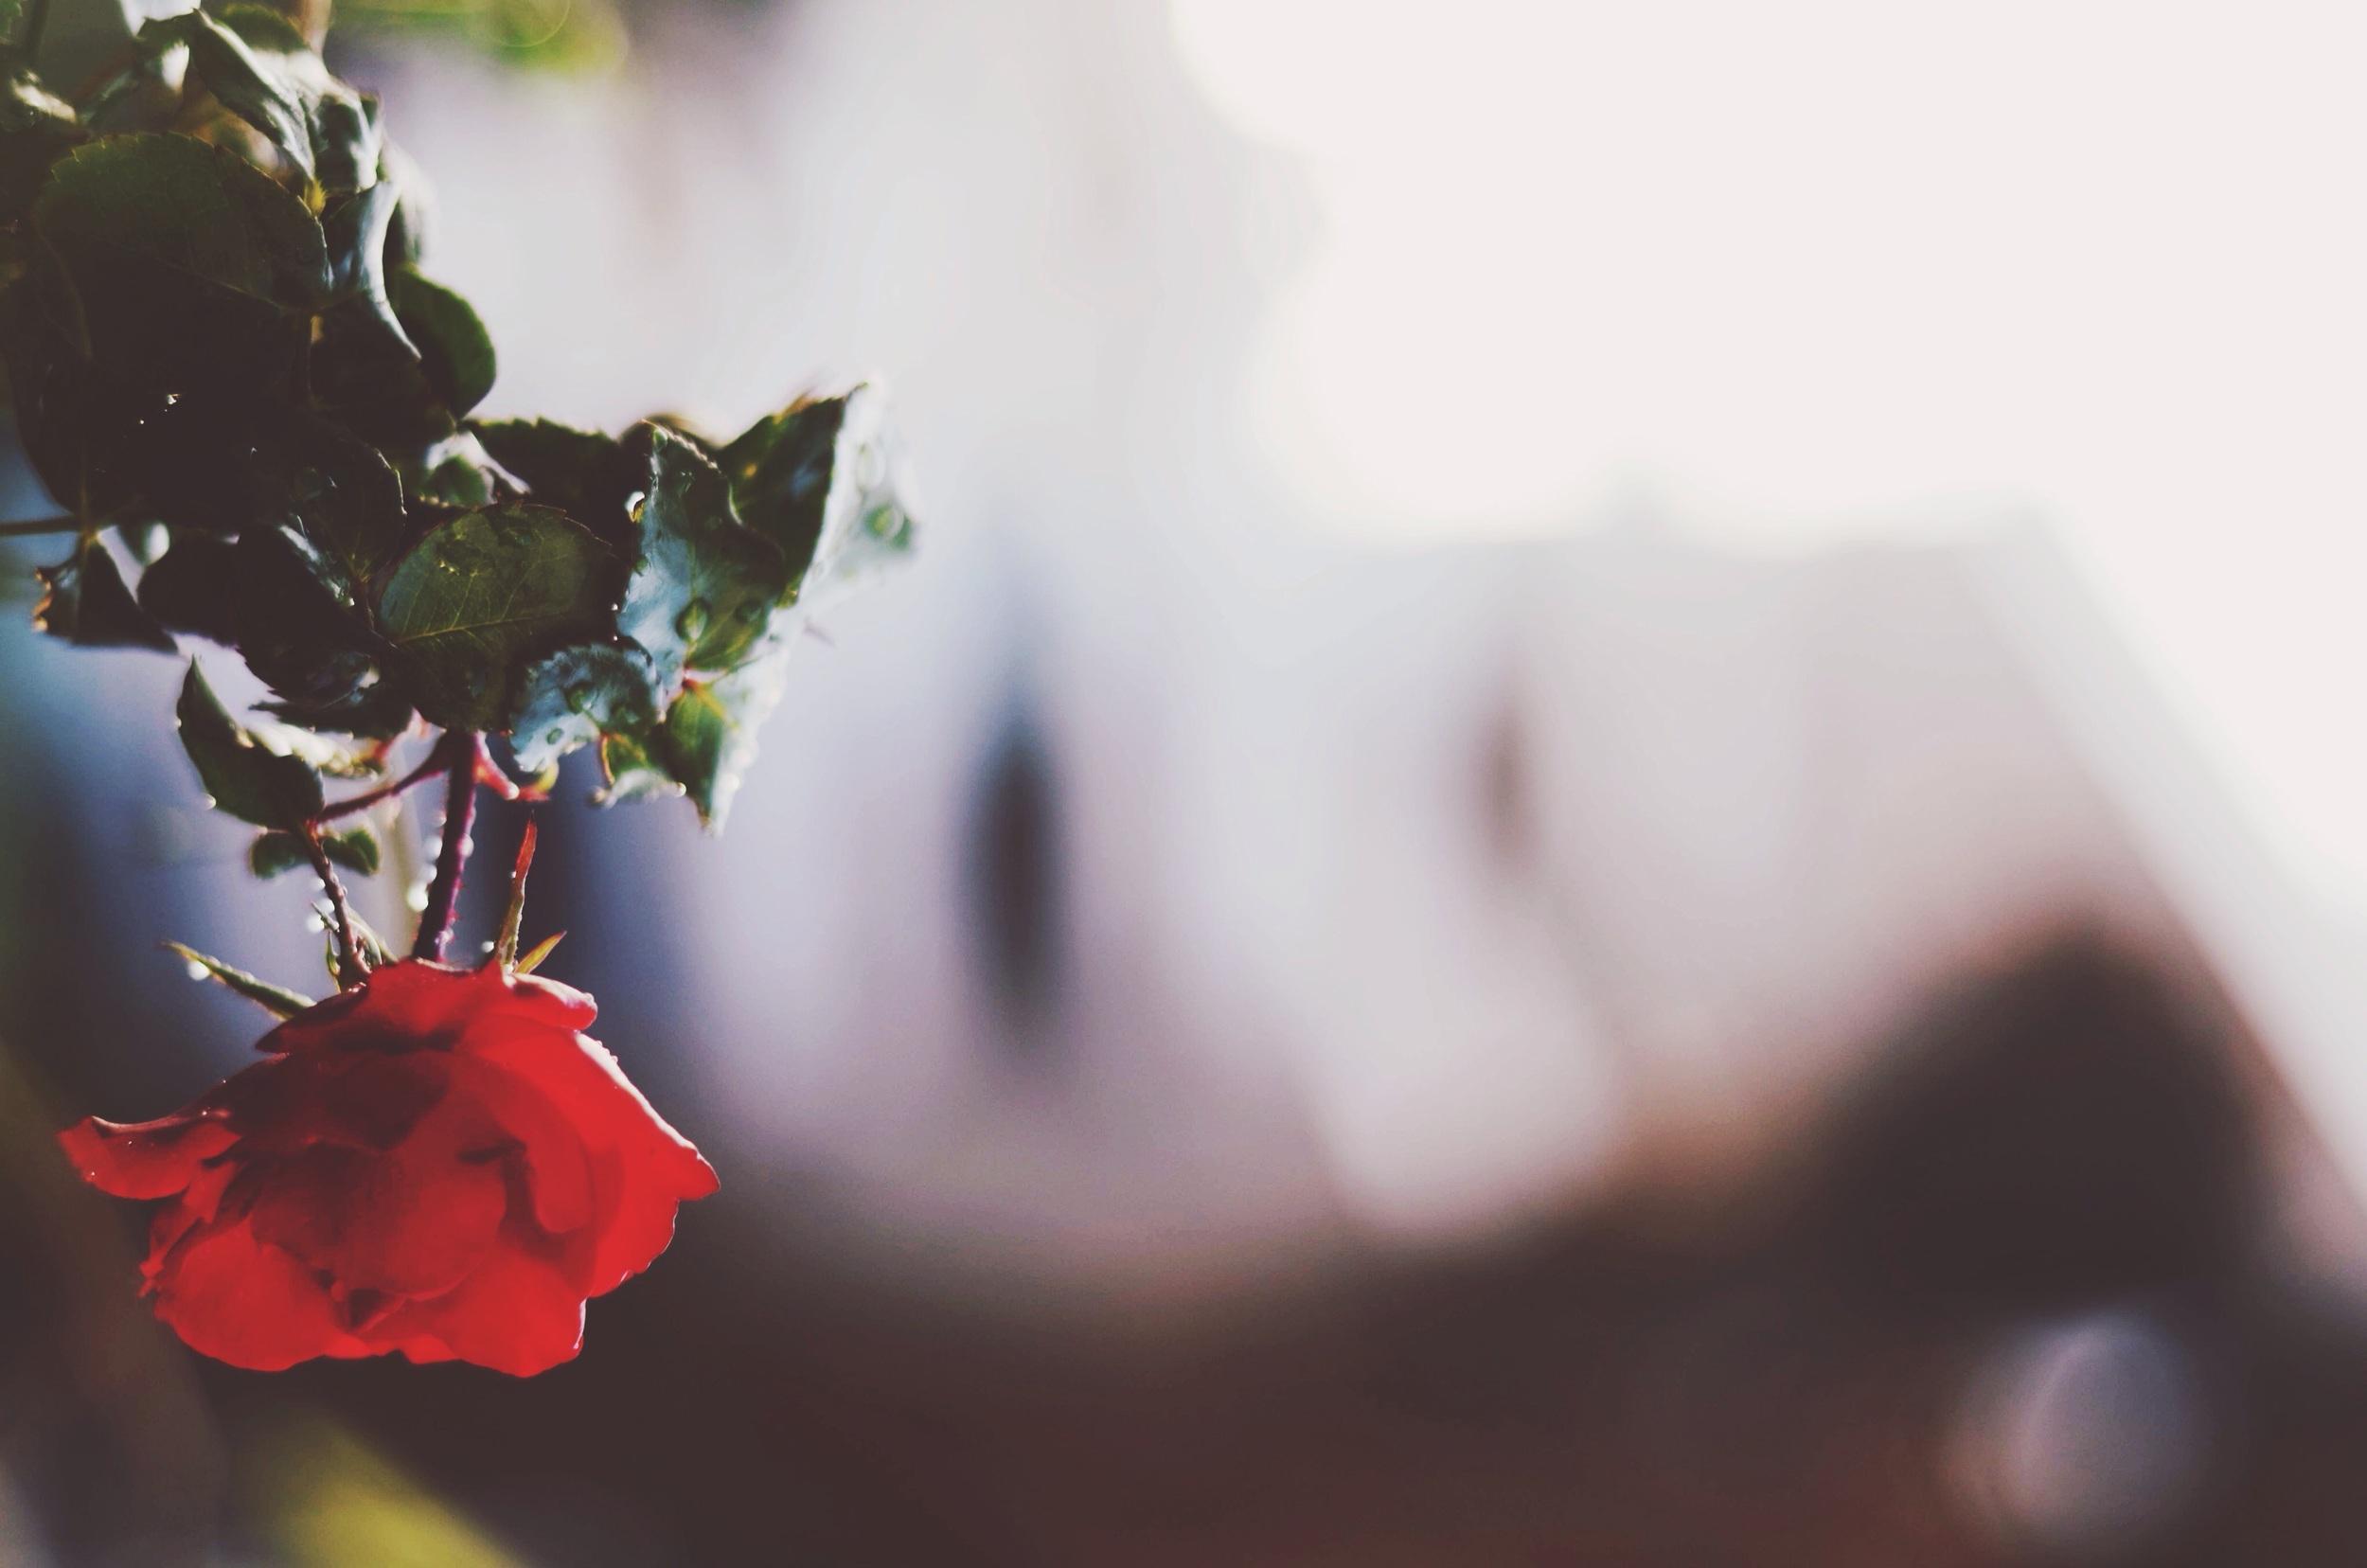 Rose in the window pot shelf // 27 may